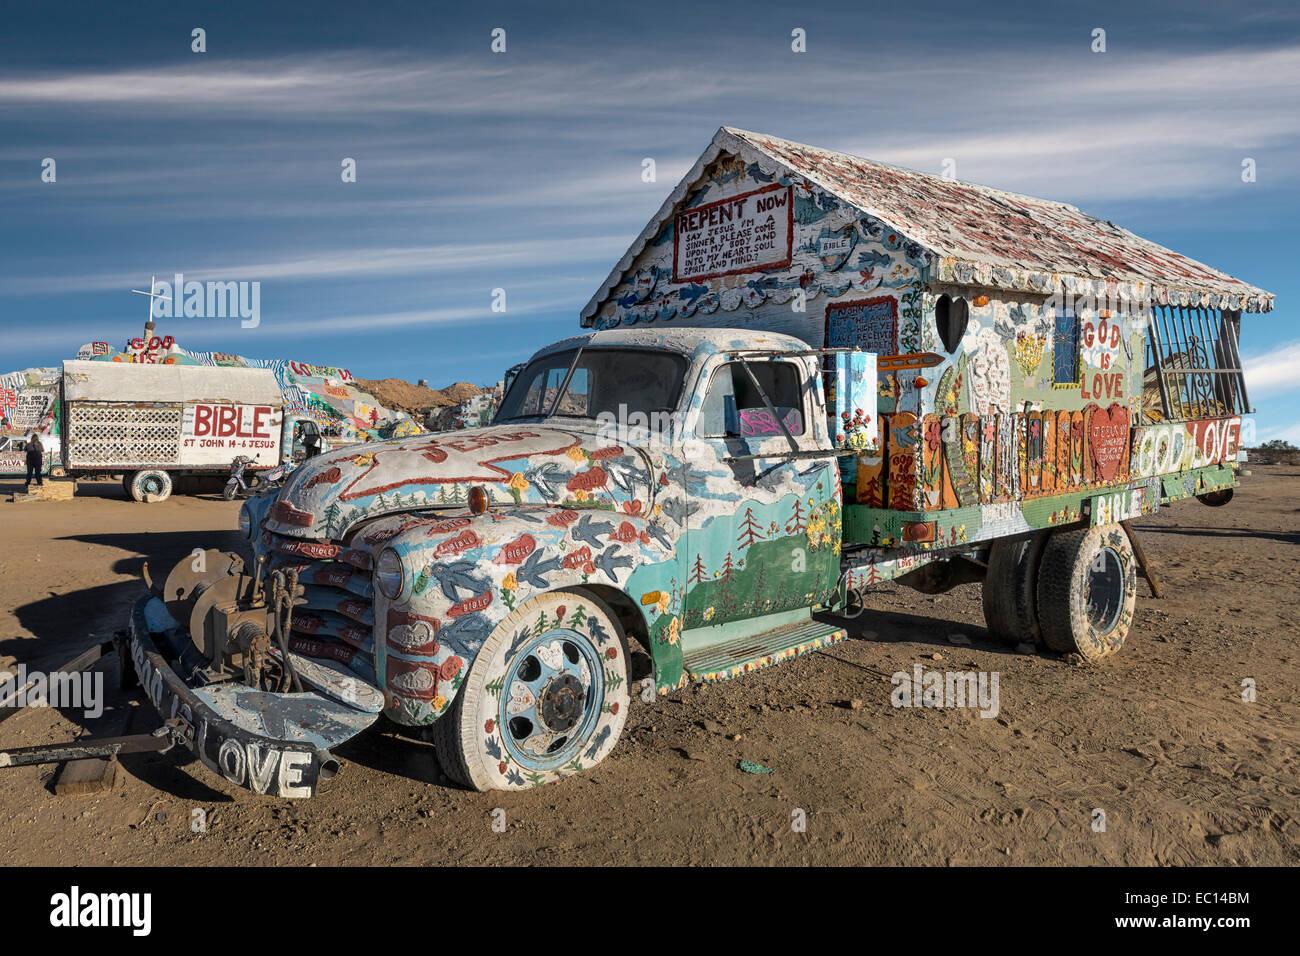 A truck decorated by folk artist Leonard Knight at the Salvation Mountain religious folk art site near Niland California - Stock Image